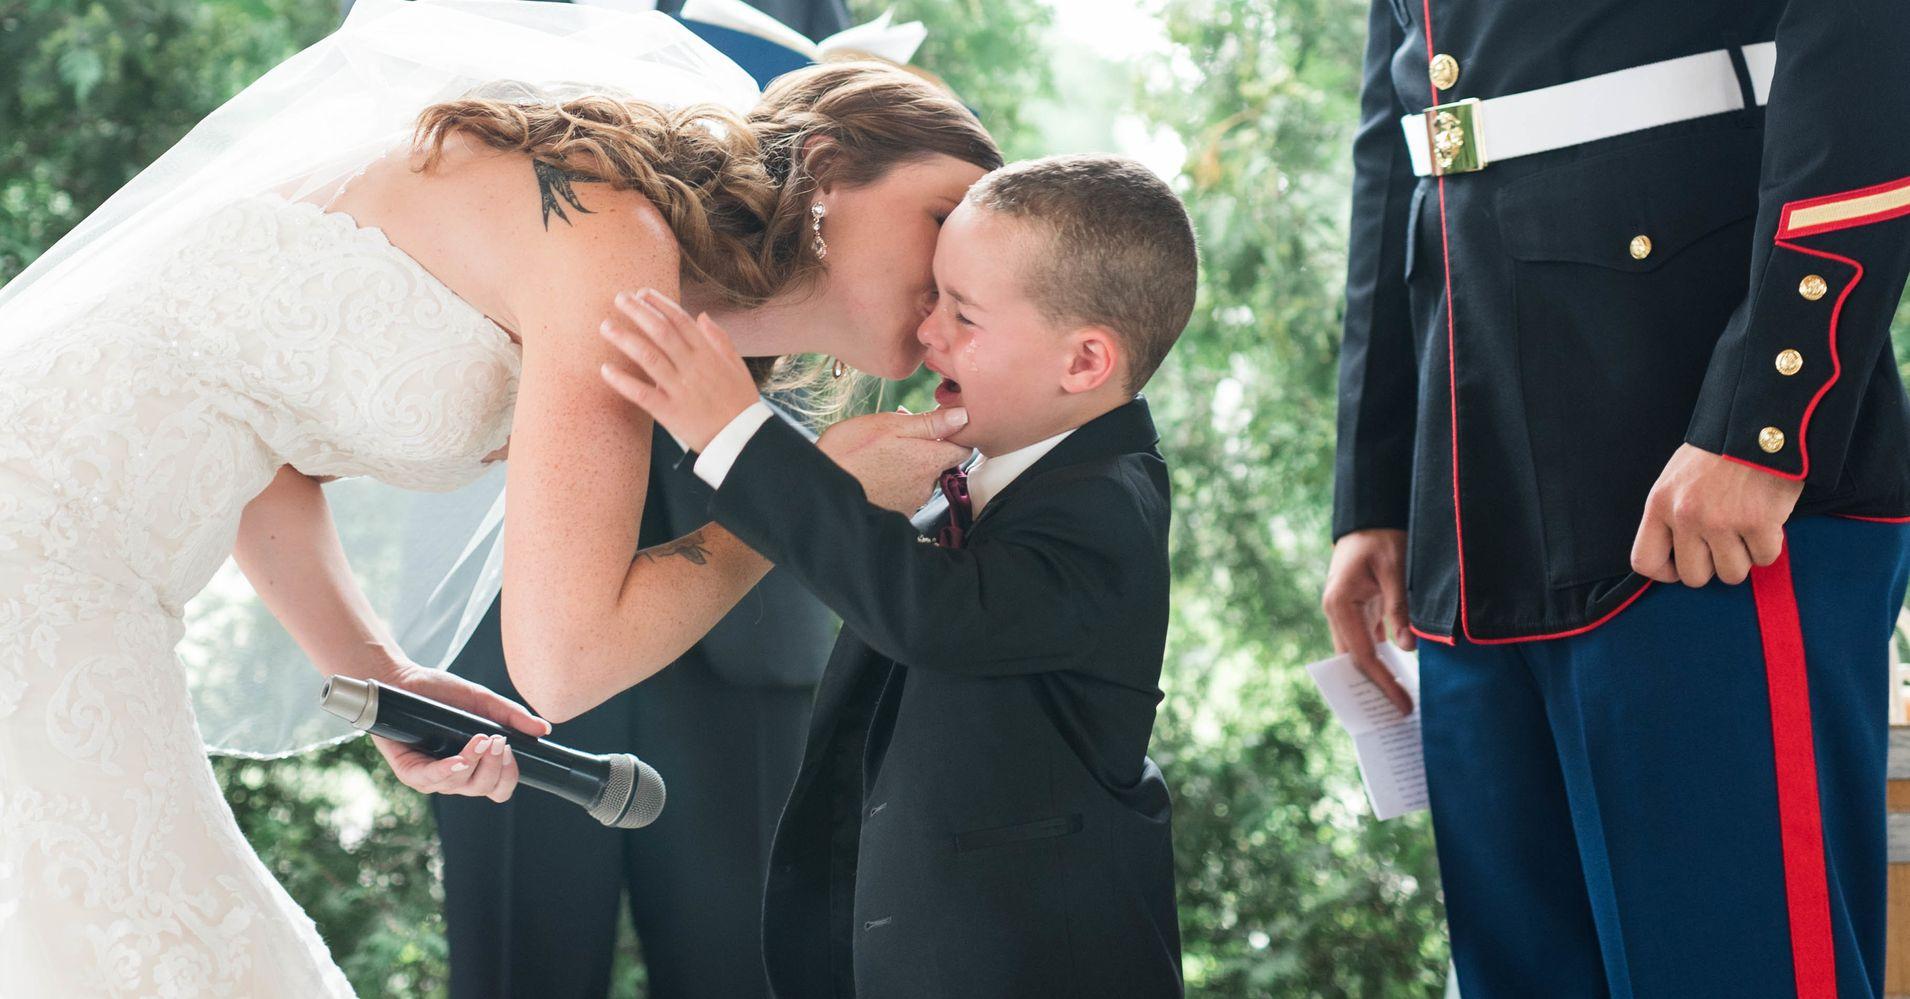 vows to stepchildren samples